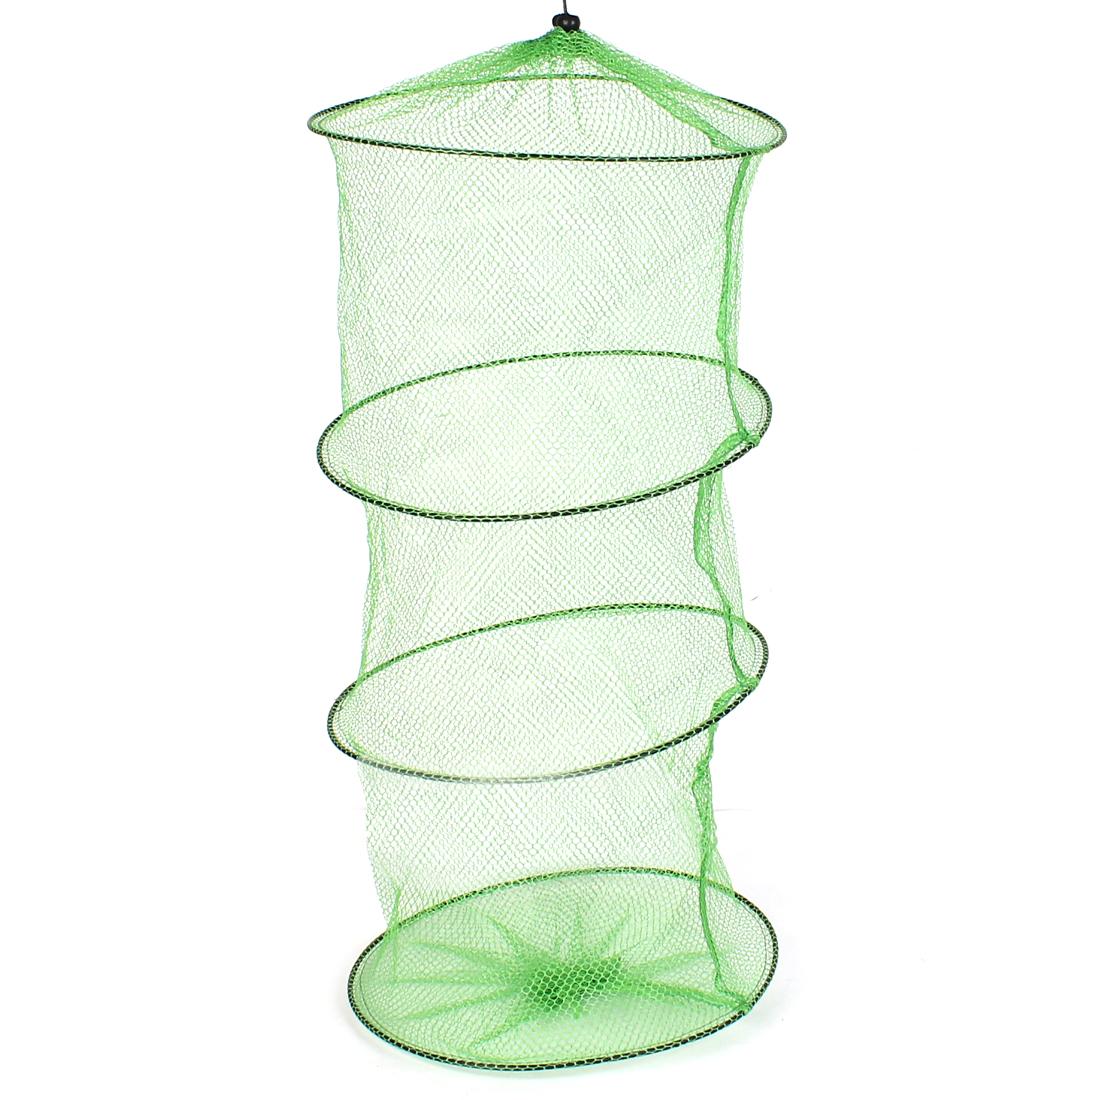 26 Inch Green Crab Crawfish Shrimp Collapsible Outdoor Camping Nylon Fishing Cage Fishing Net